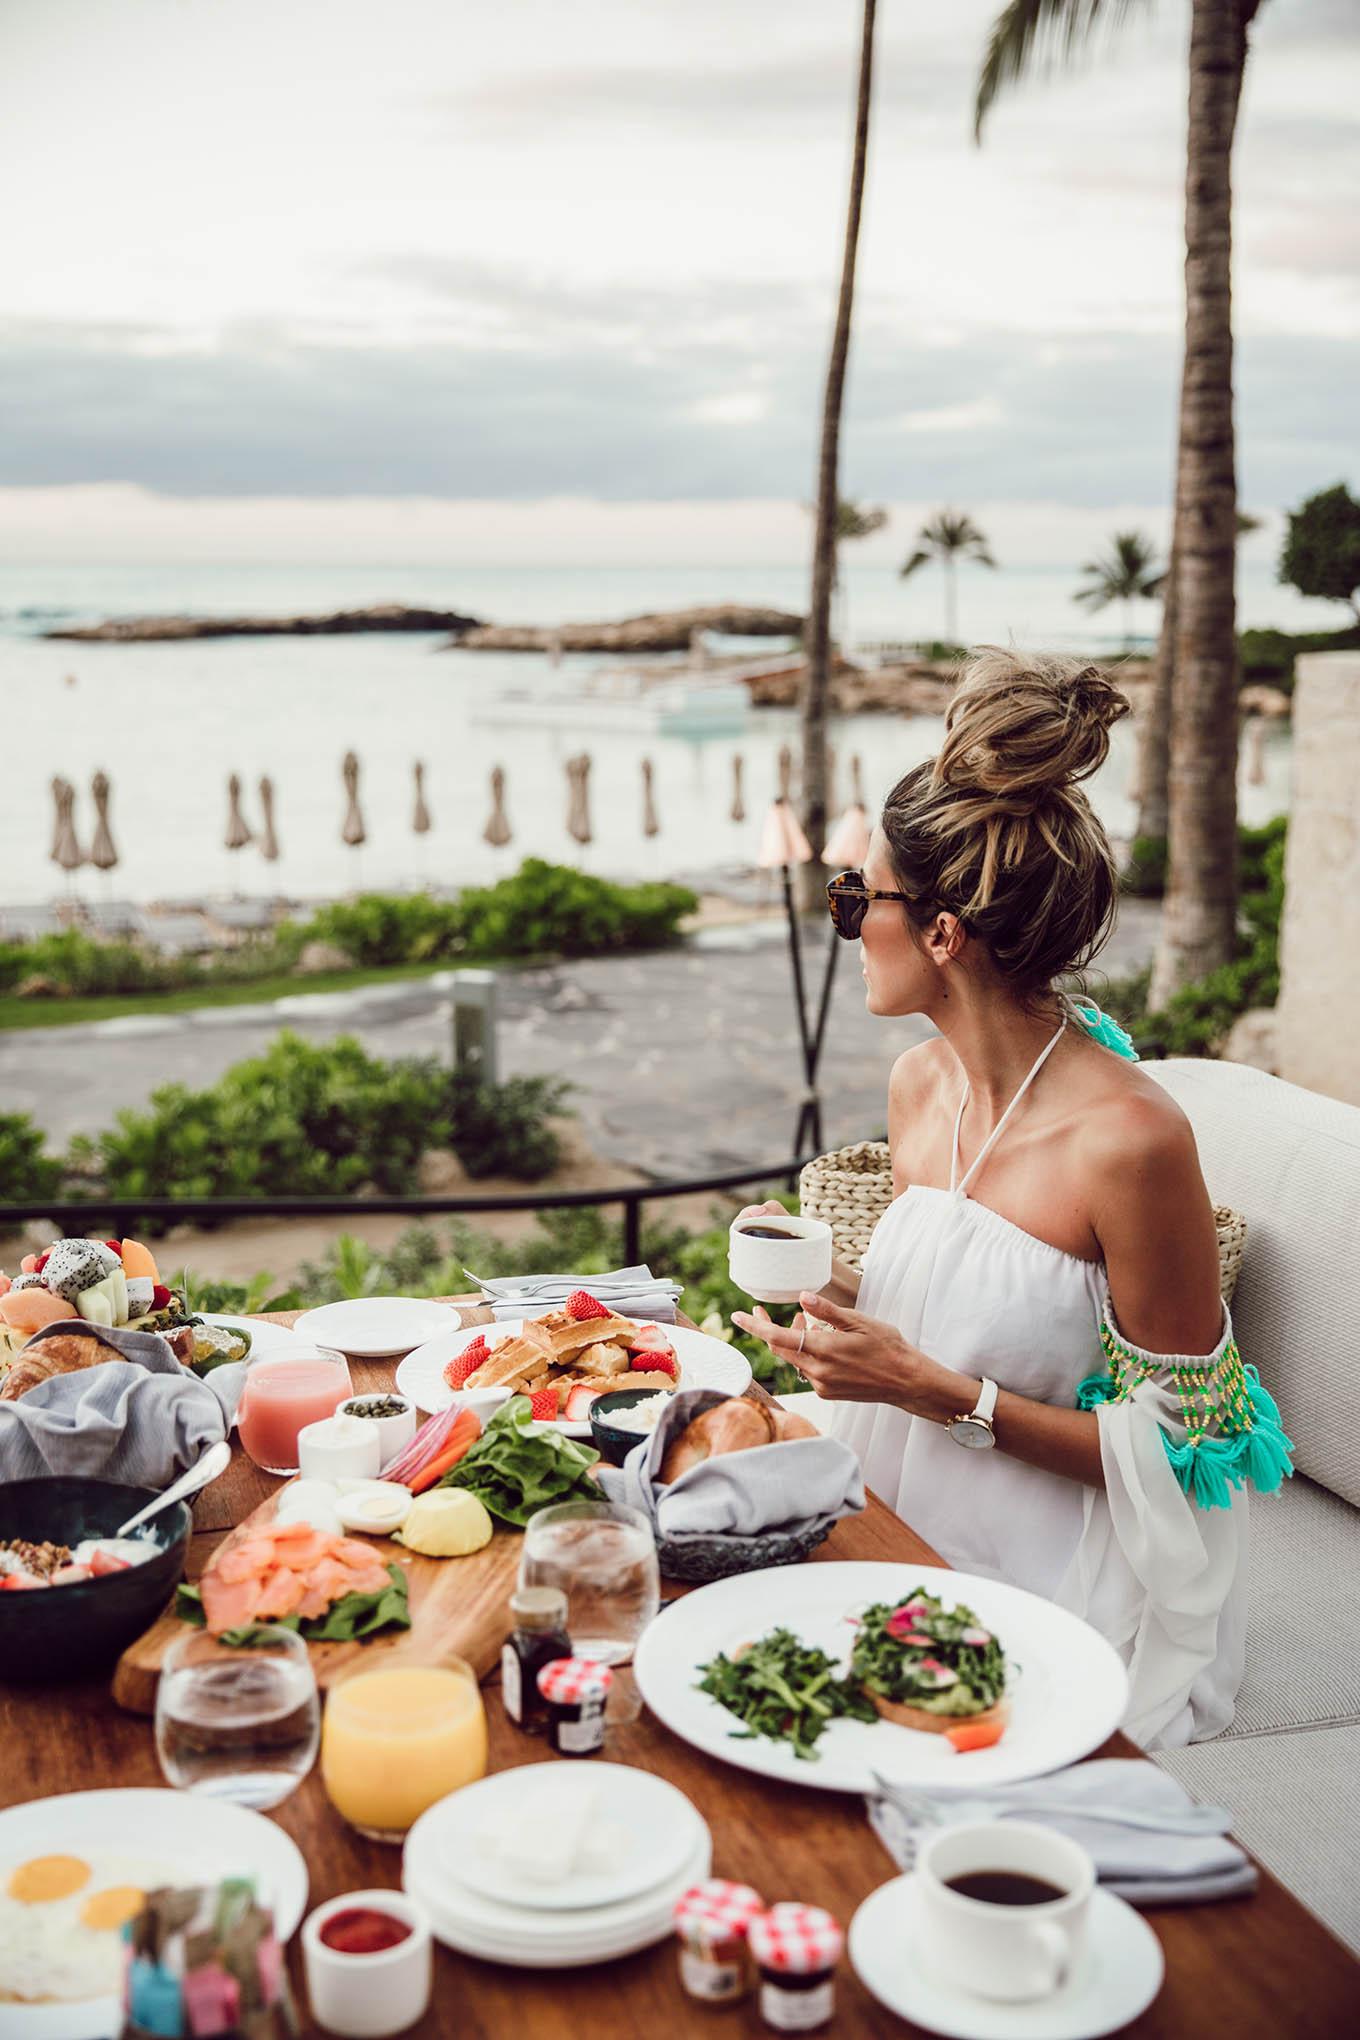 hawaii travel guide hello fashion blog